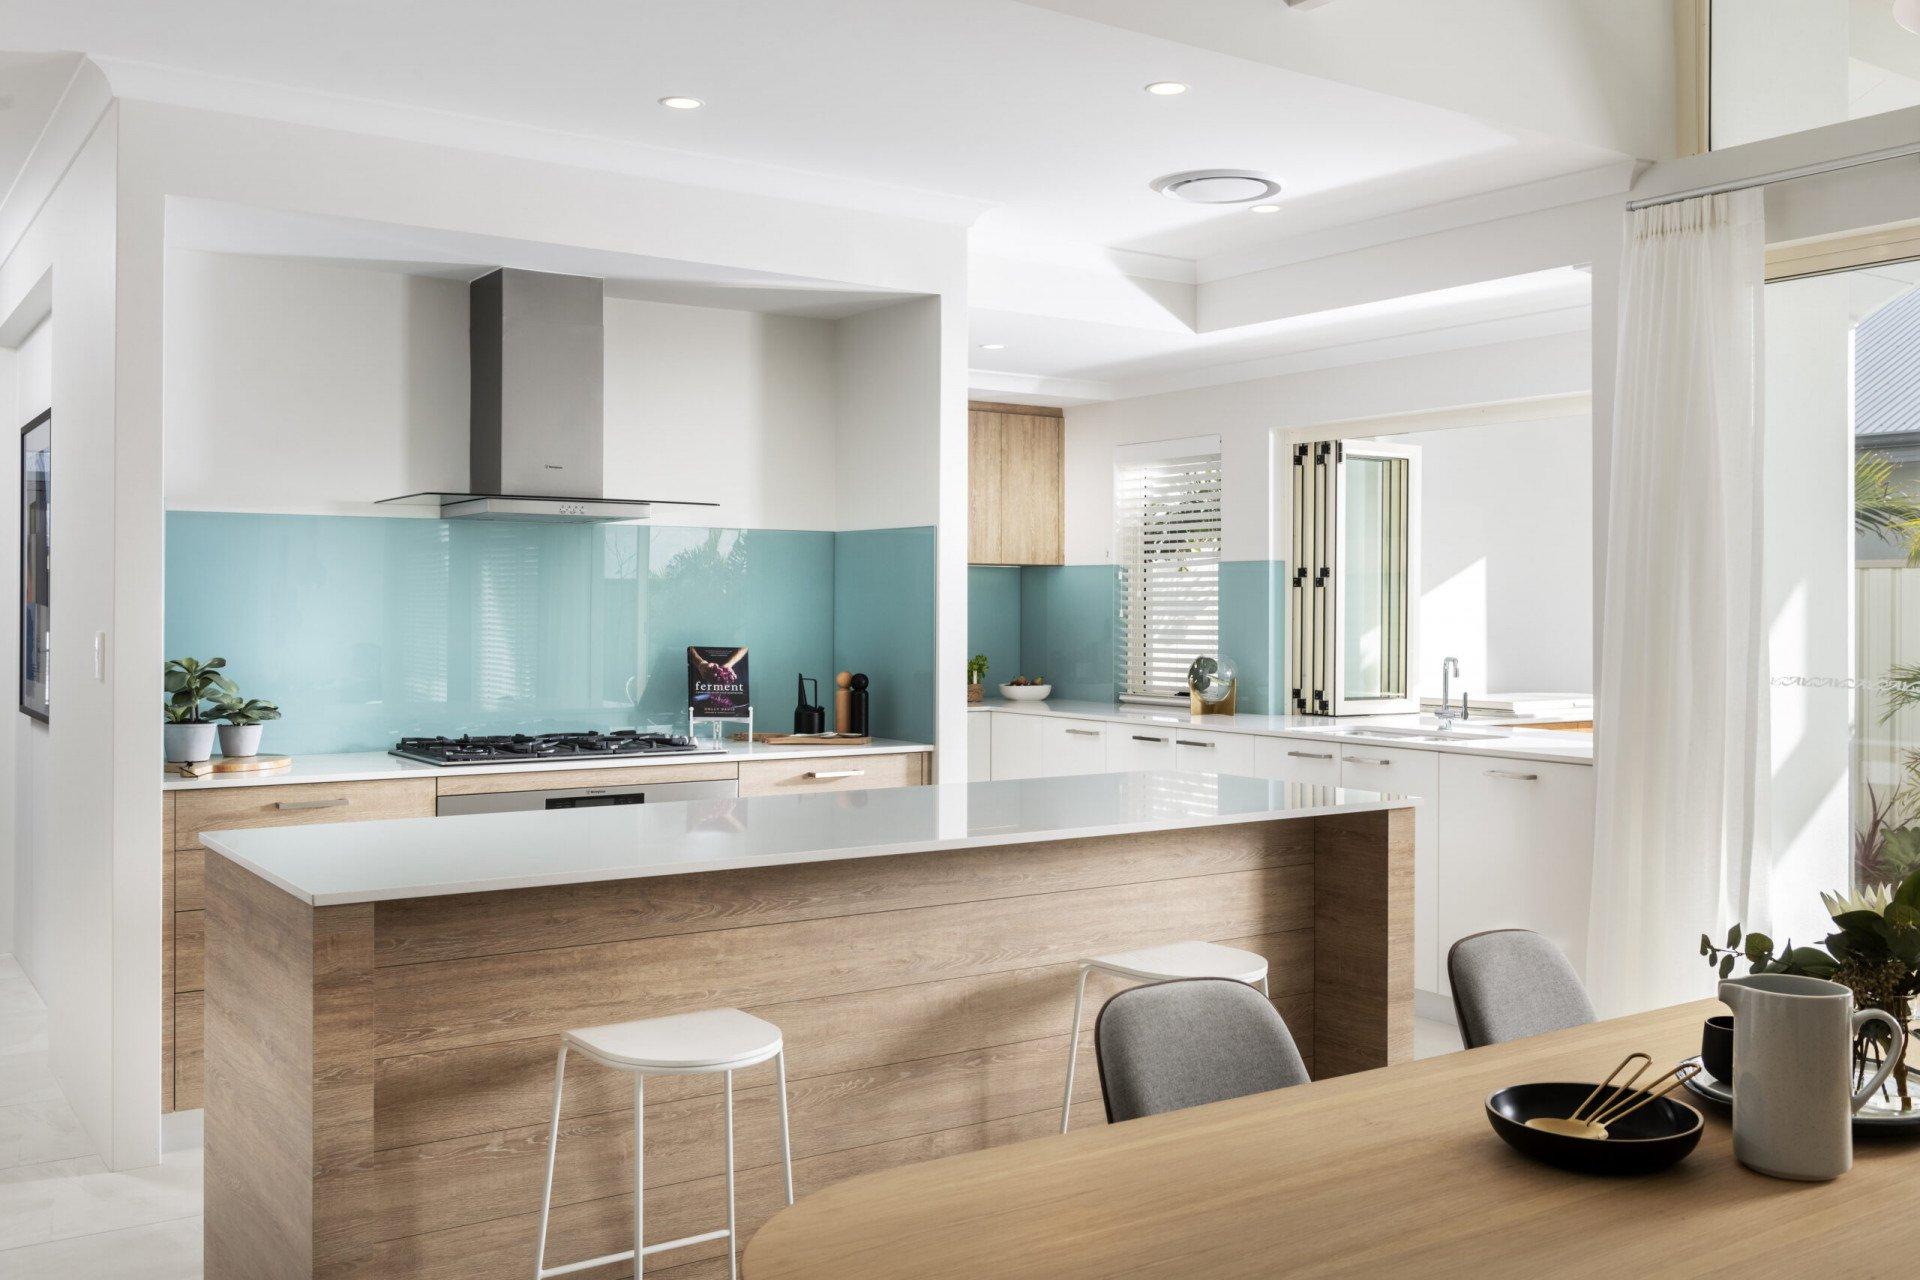 Kitchen-1-2-scaled